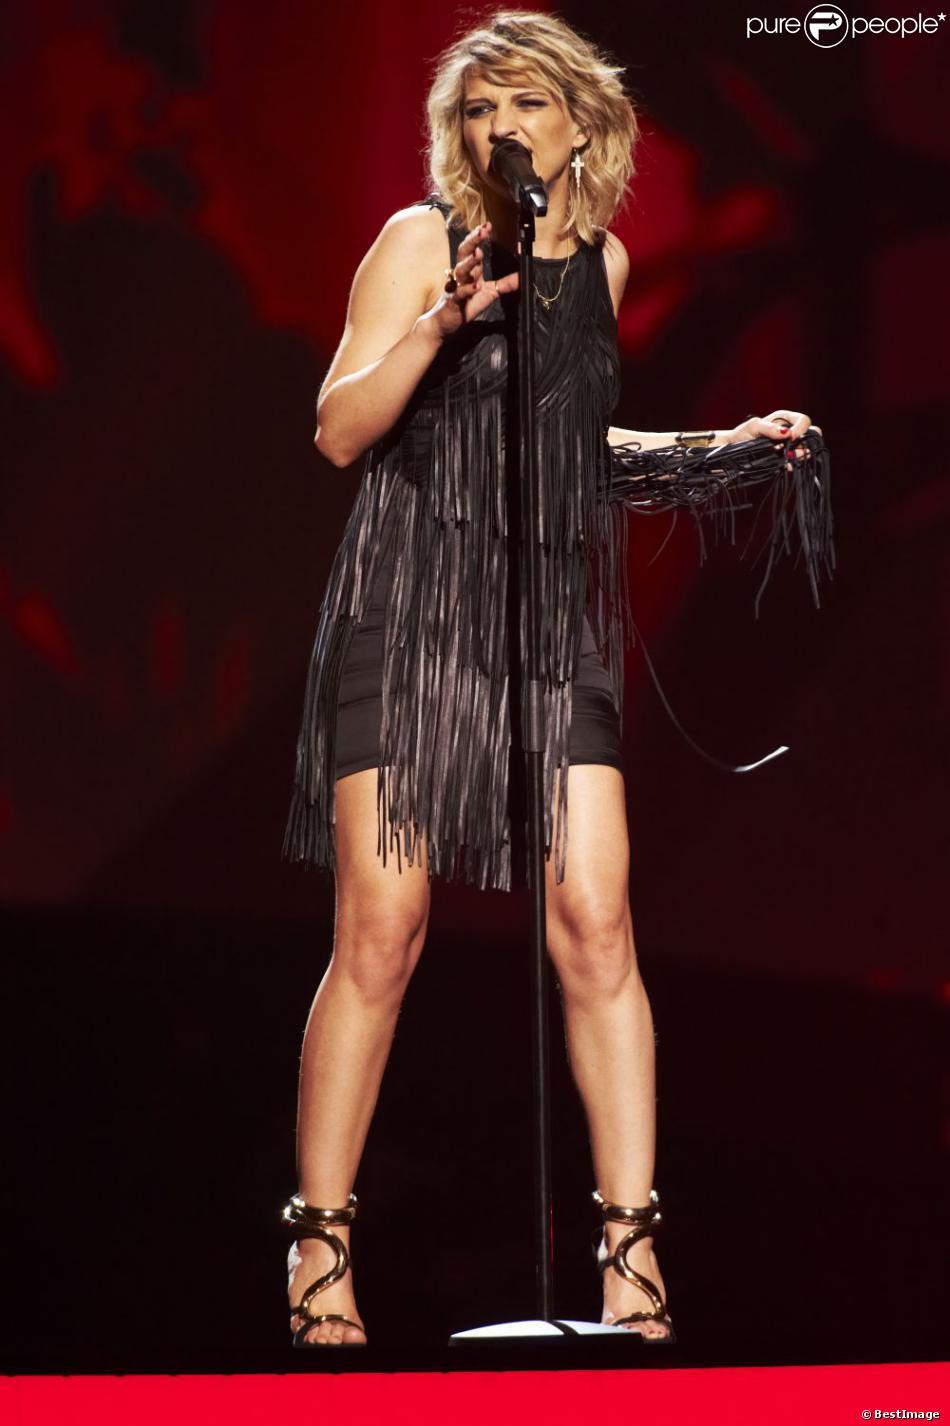 eurovision 2013 le danemark triomphe amandine bourgeois boit la tasse purepeople. Black Bedroom Furniture Sets. Home Design Ideas